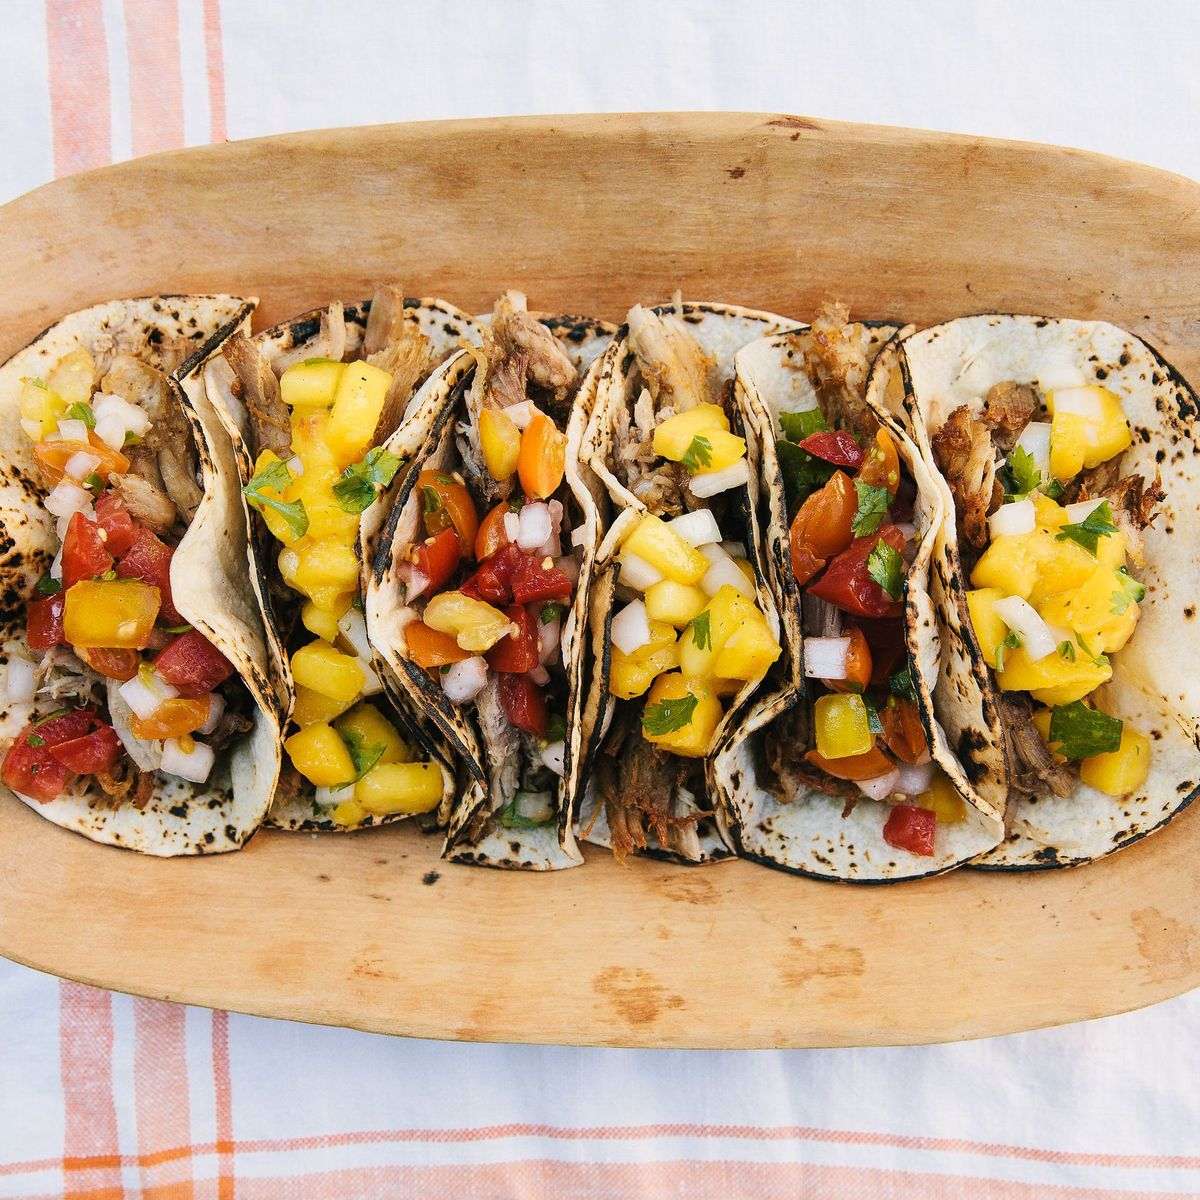 Slow Cooker Carnitas Tacos With Summer Peach Tomato Salsas Recipe